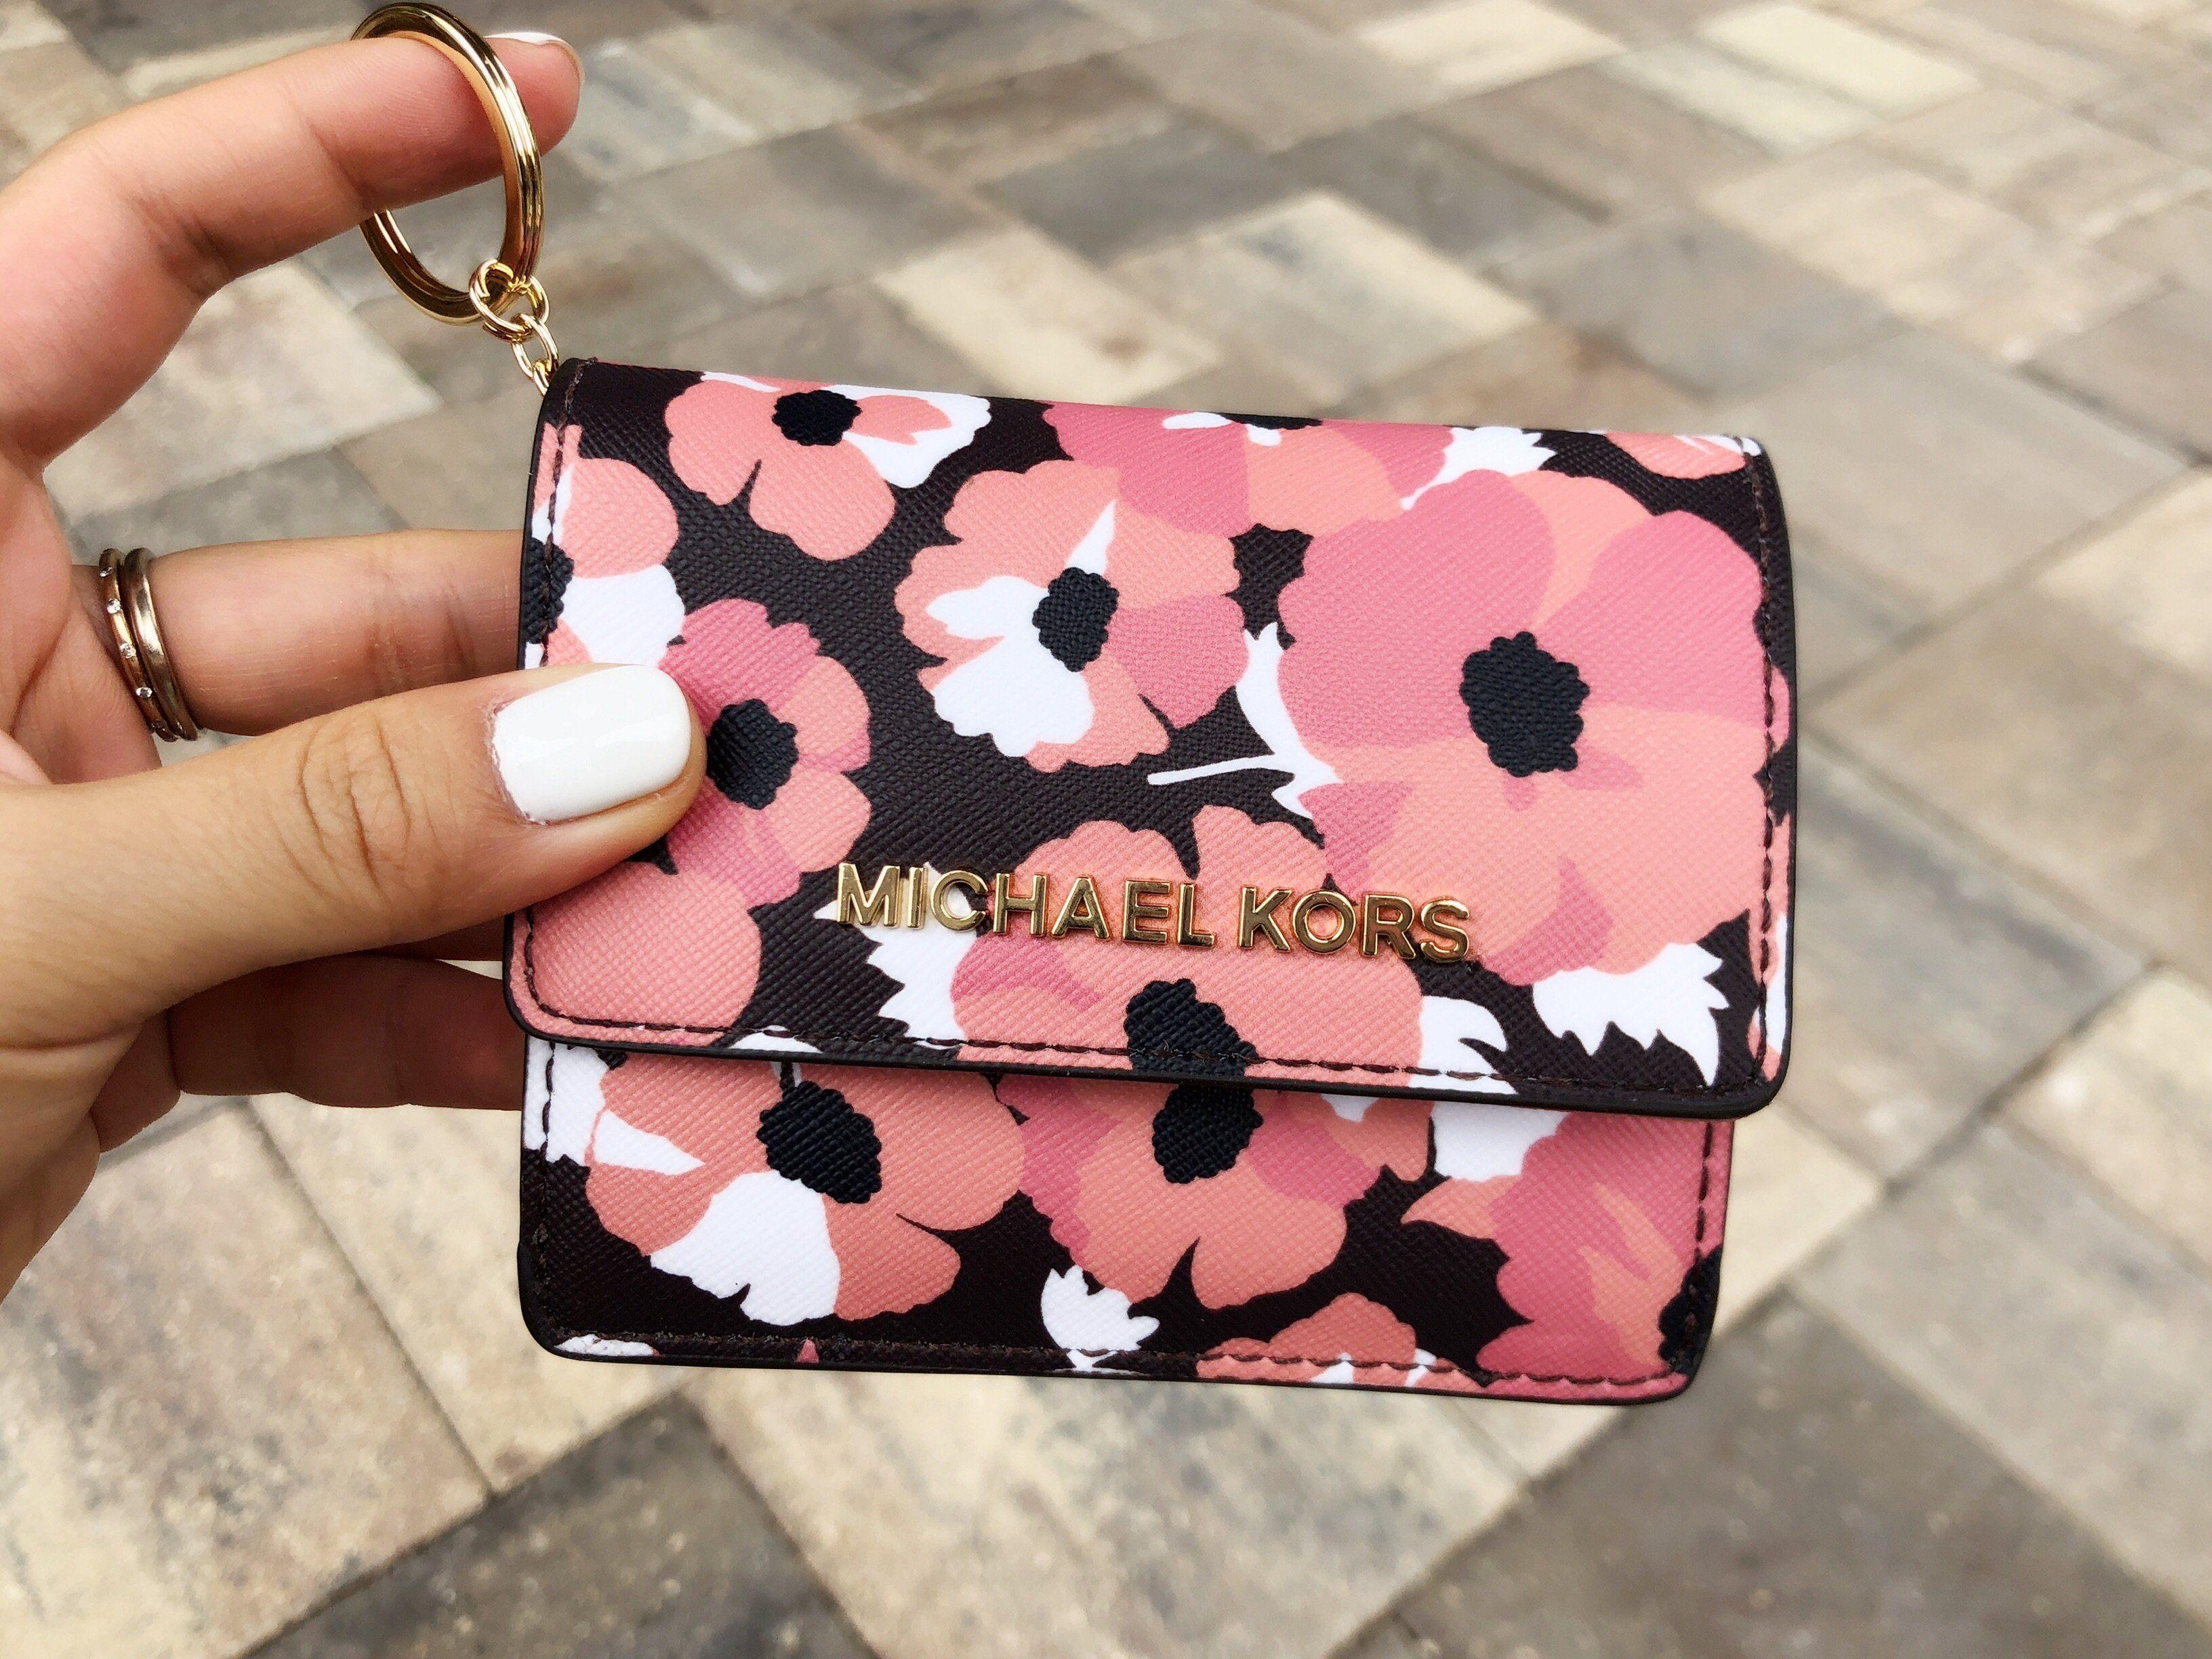 096b350d7d2a Michael Kors Jet Set Card Holder Key Ring Chain ID Peach Floral   topratedseller  Handbags  ebaystore  amazon  Poshmark  top  posh   ebaycommunity ...